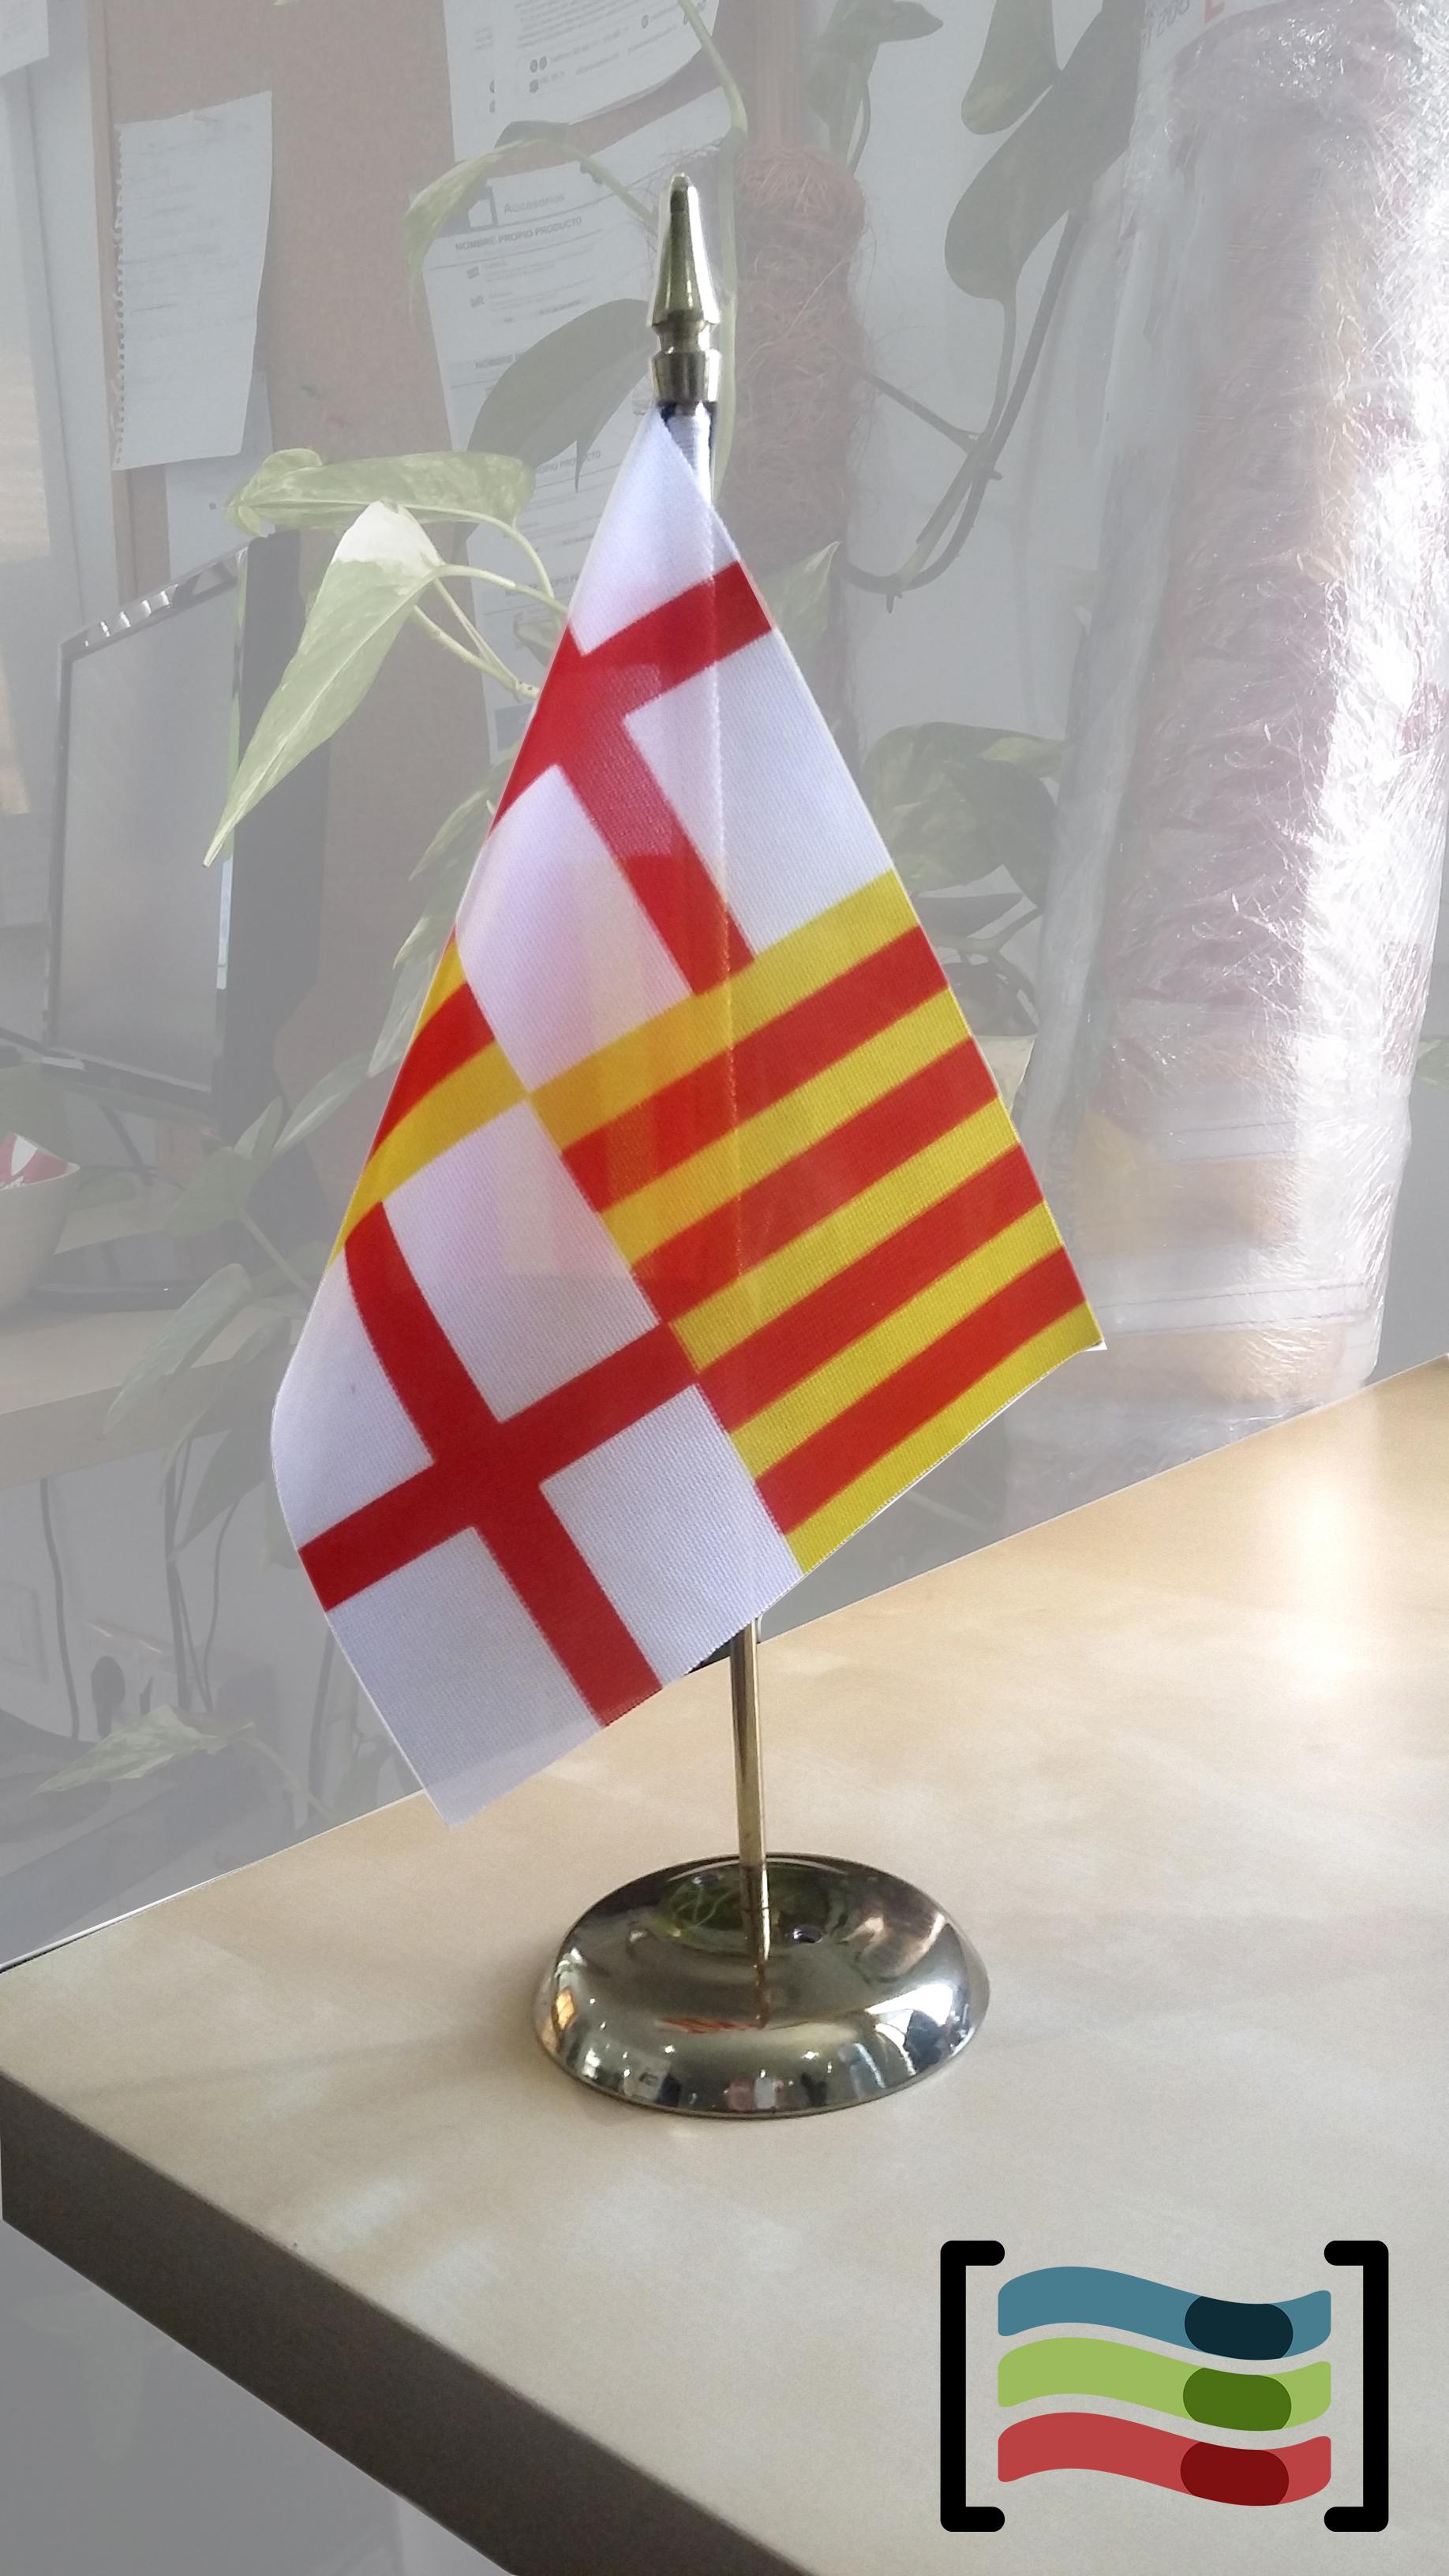 Comprar bandera de Barcelona - Comprar Banderas 52ad86e8f6e